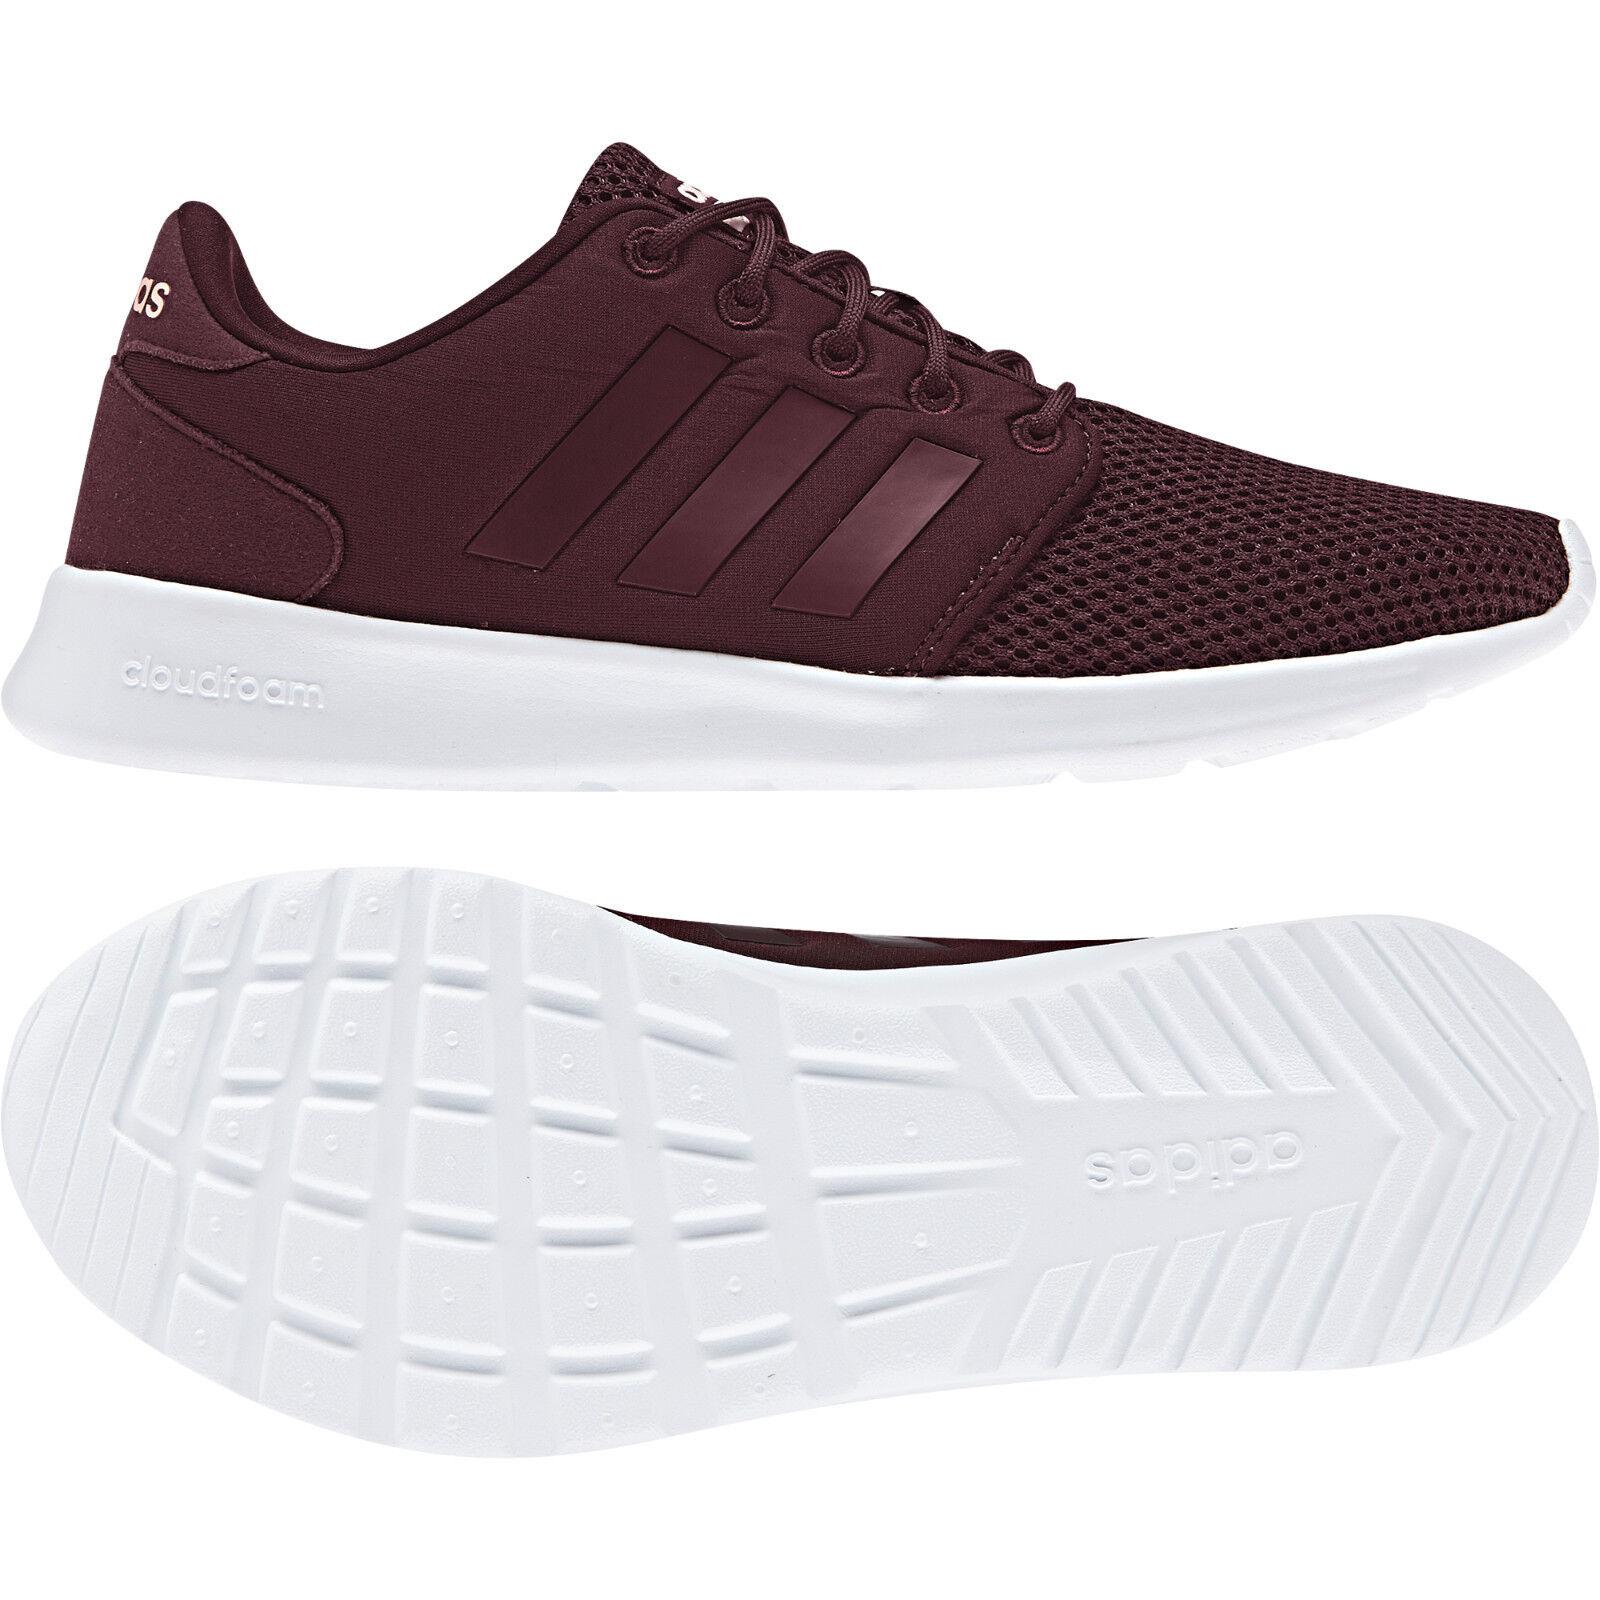 Adidas Women Running shoes Cloudfoam QT Racer Fashion Sneakers Boots New B43760